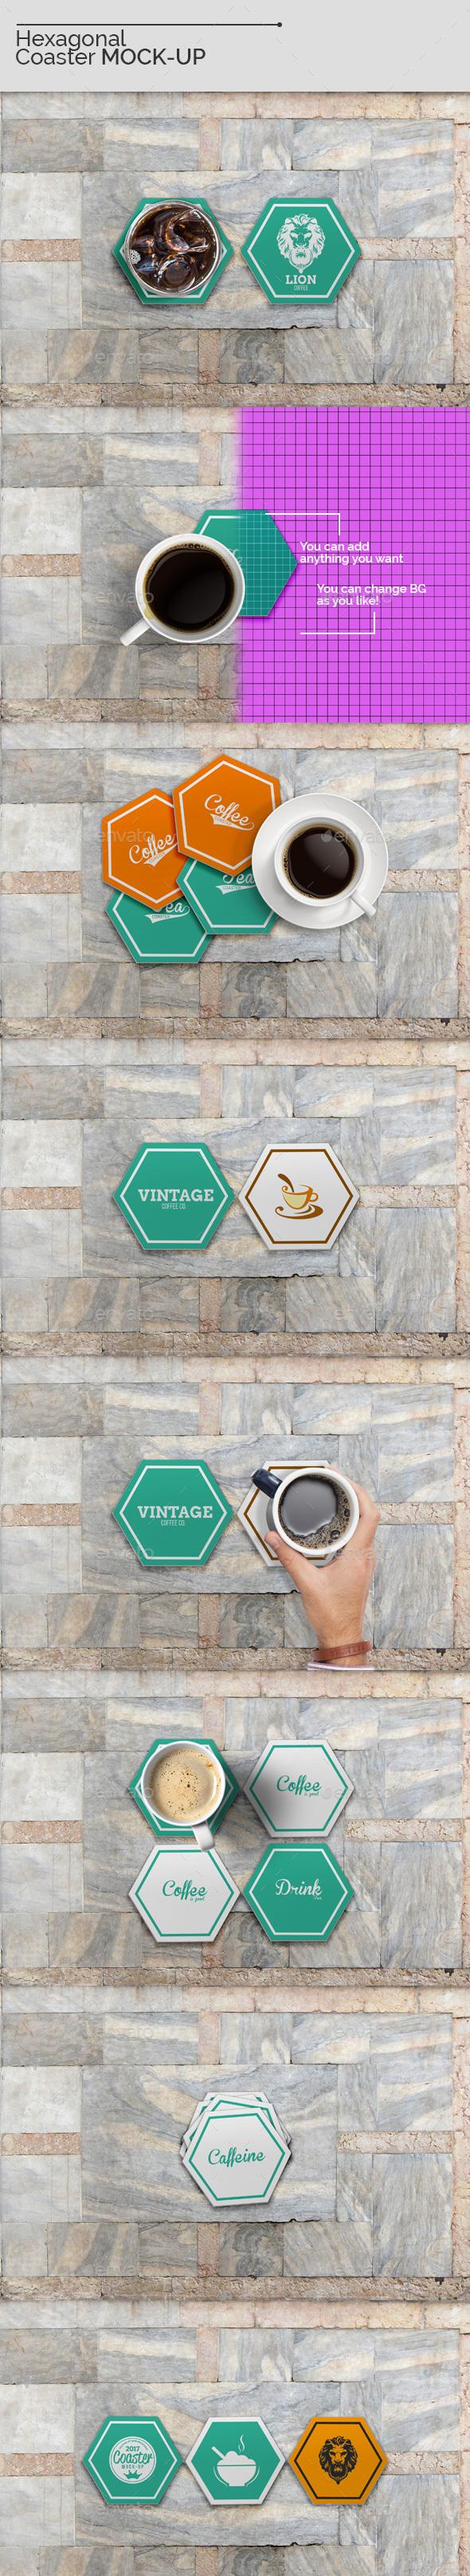 Hexagonal Coaster Mock-Ups - Miscellaneous Product Mock-Ups